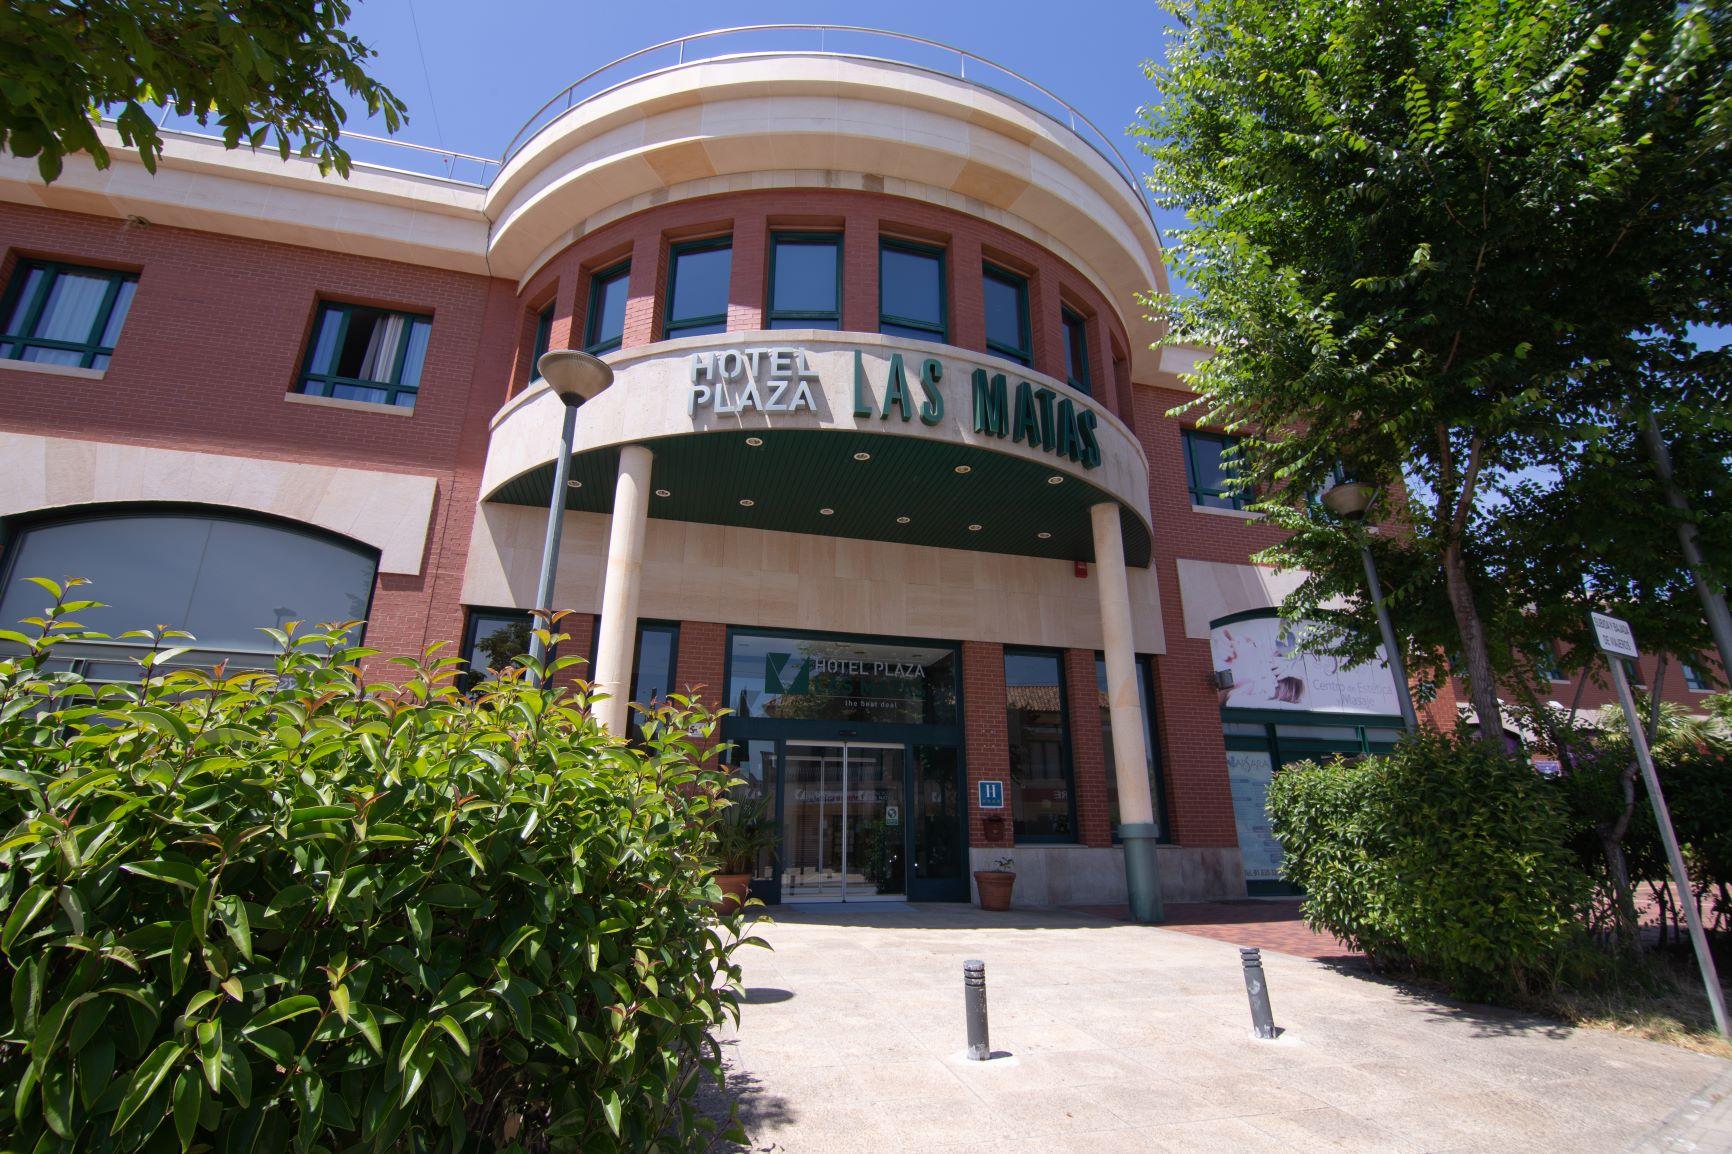 Silicius completes €19,7 million capital increase after acquiring Ibérica Inmobiliaria